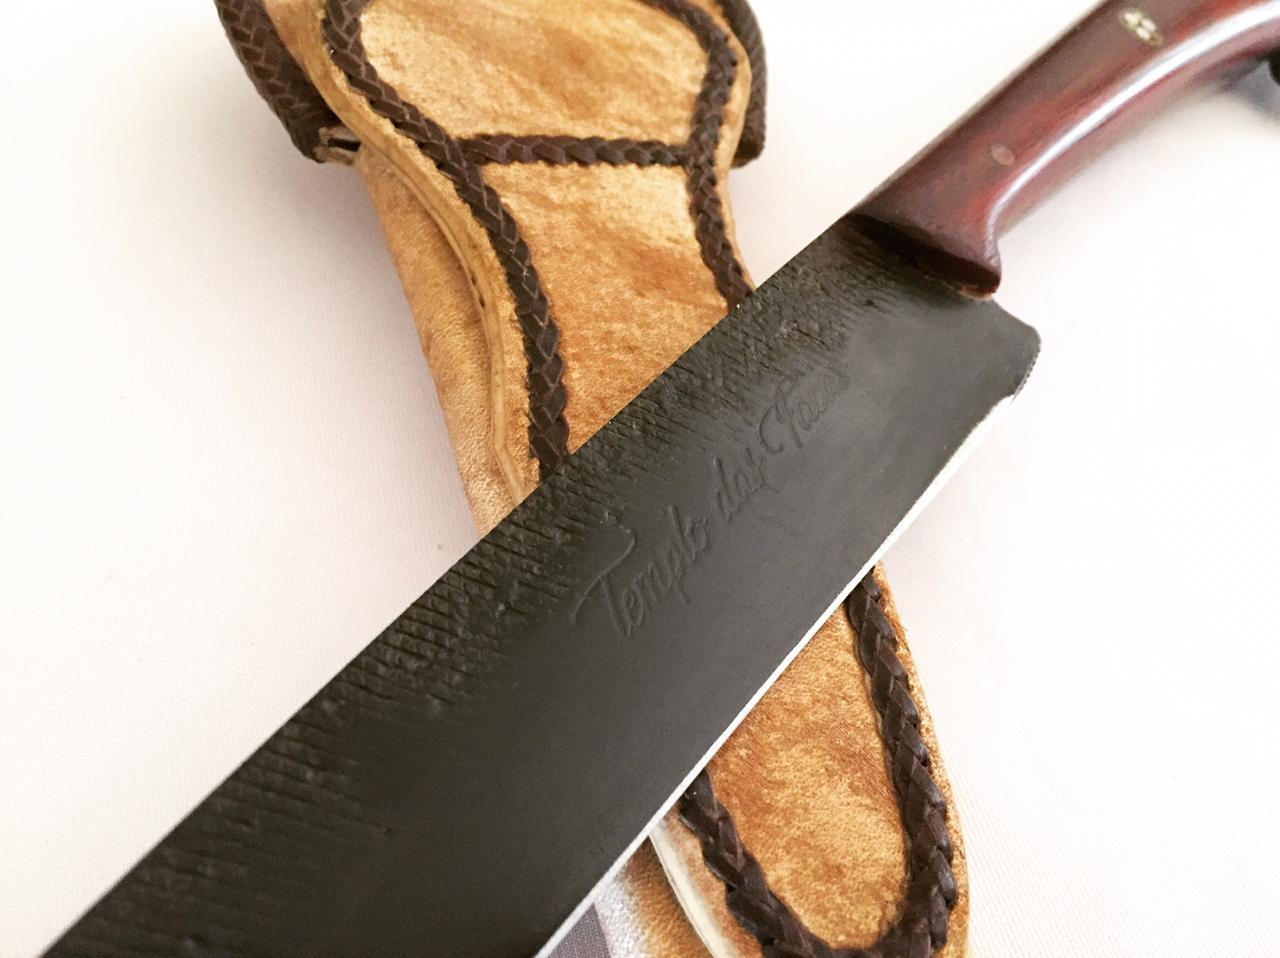 Faca artesanal forjada de lima antiga 9 polegadas